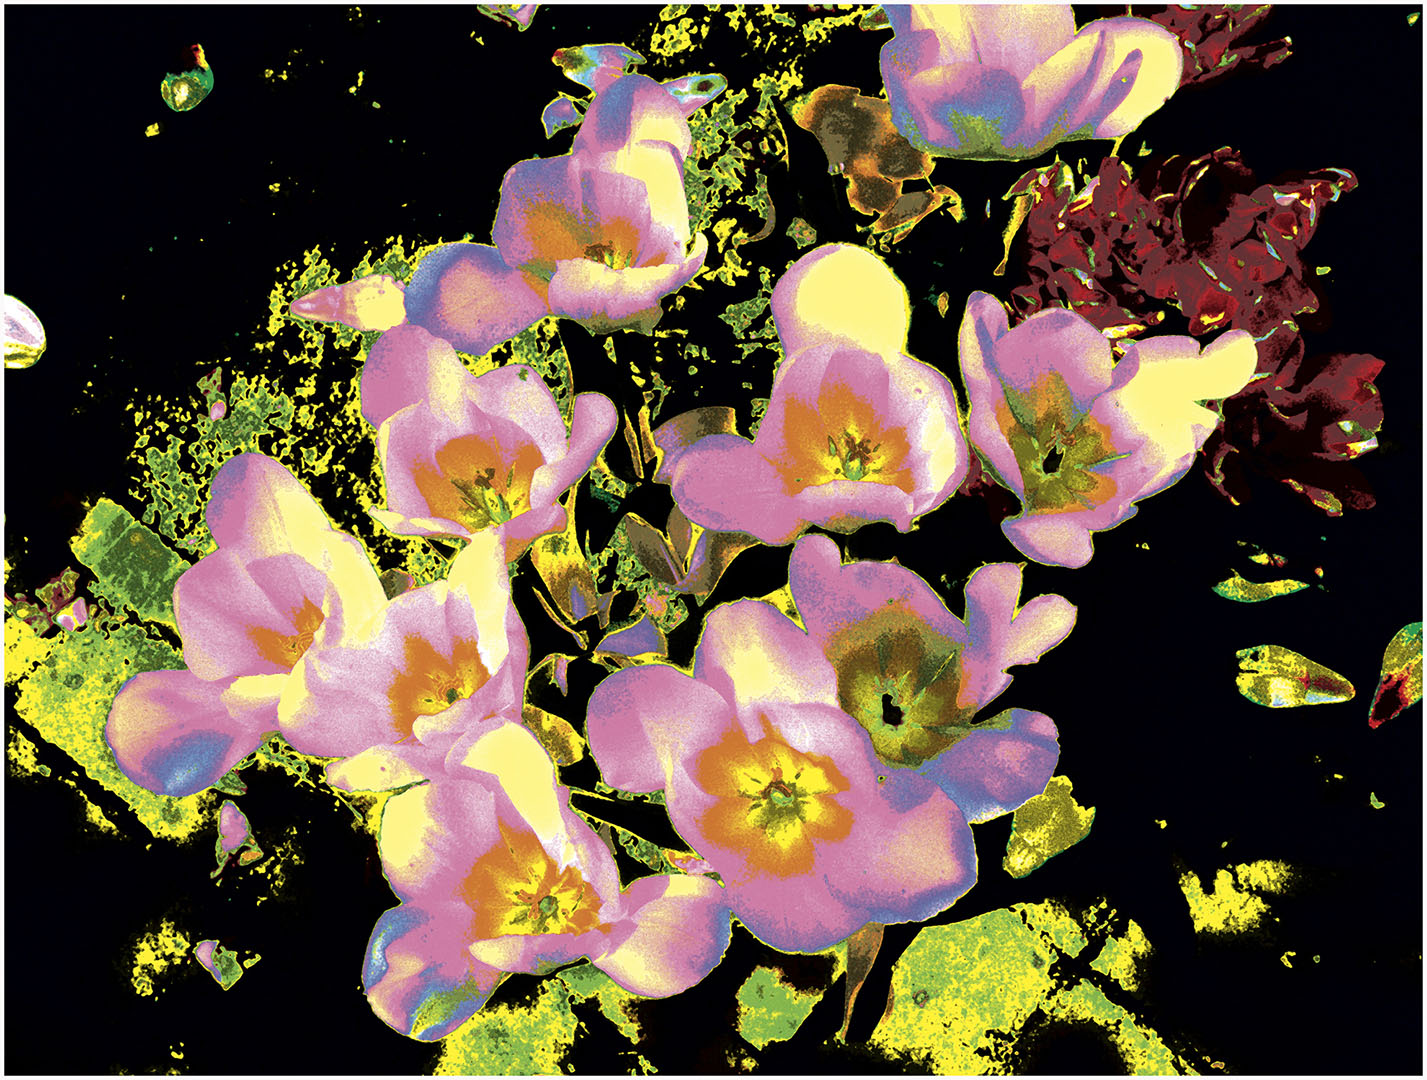 Flowers_063_ROX98